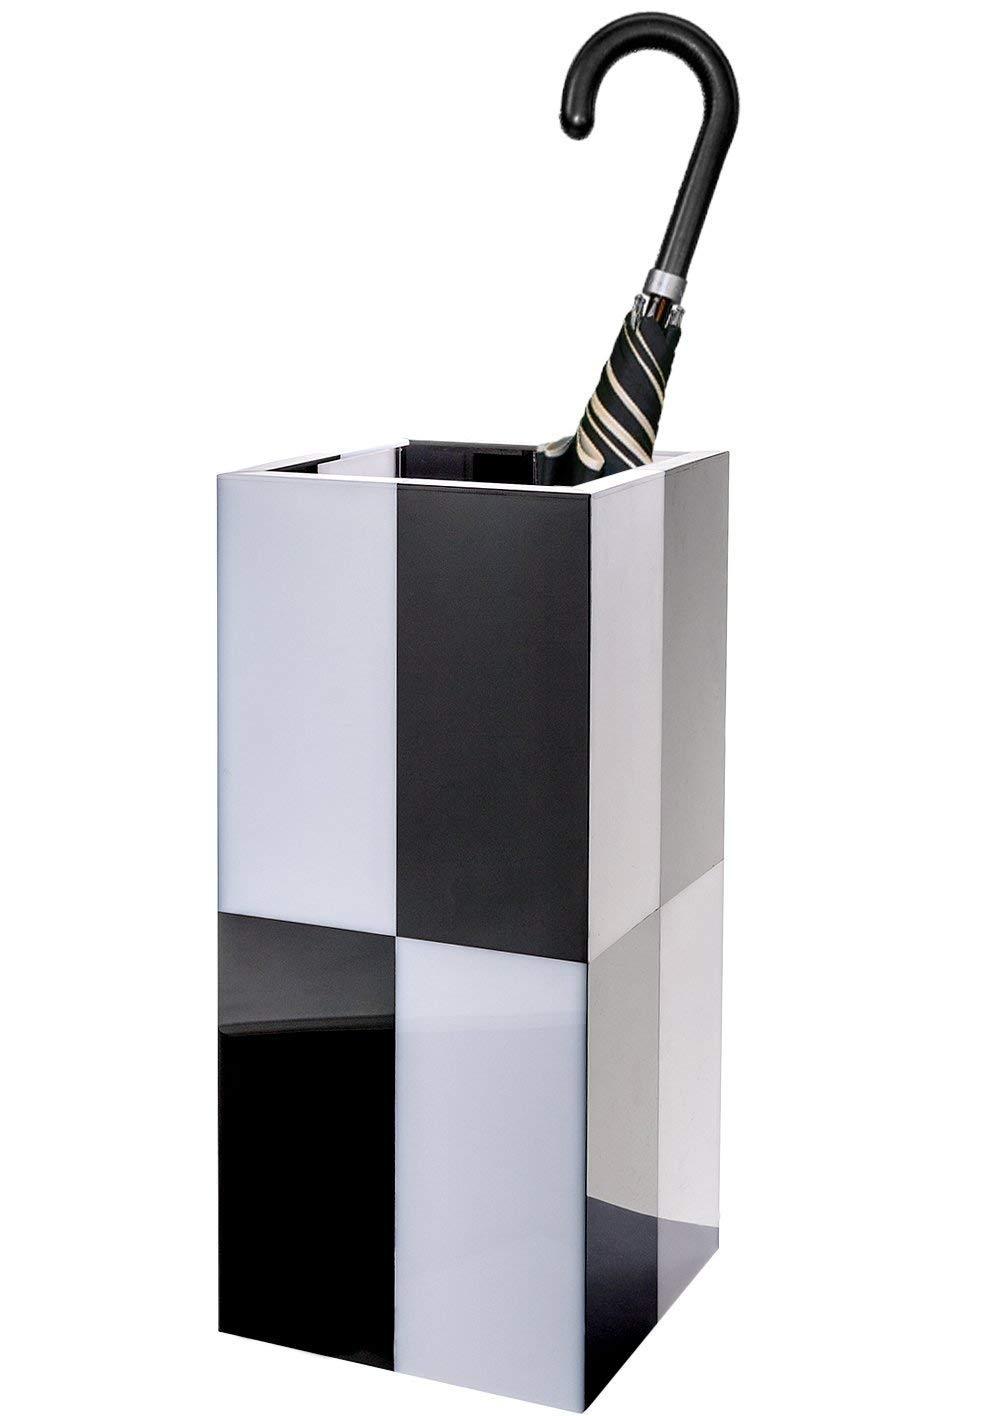 Dualplex Super Quality Umbrella Stand, Checkerboard Umbrella Holder, Durable Acrylic Material, Hallway Entry Décor Square Shape